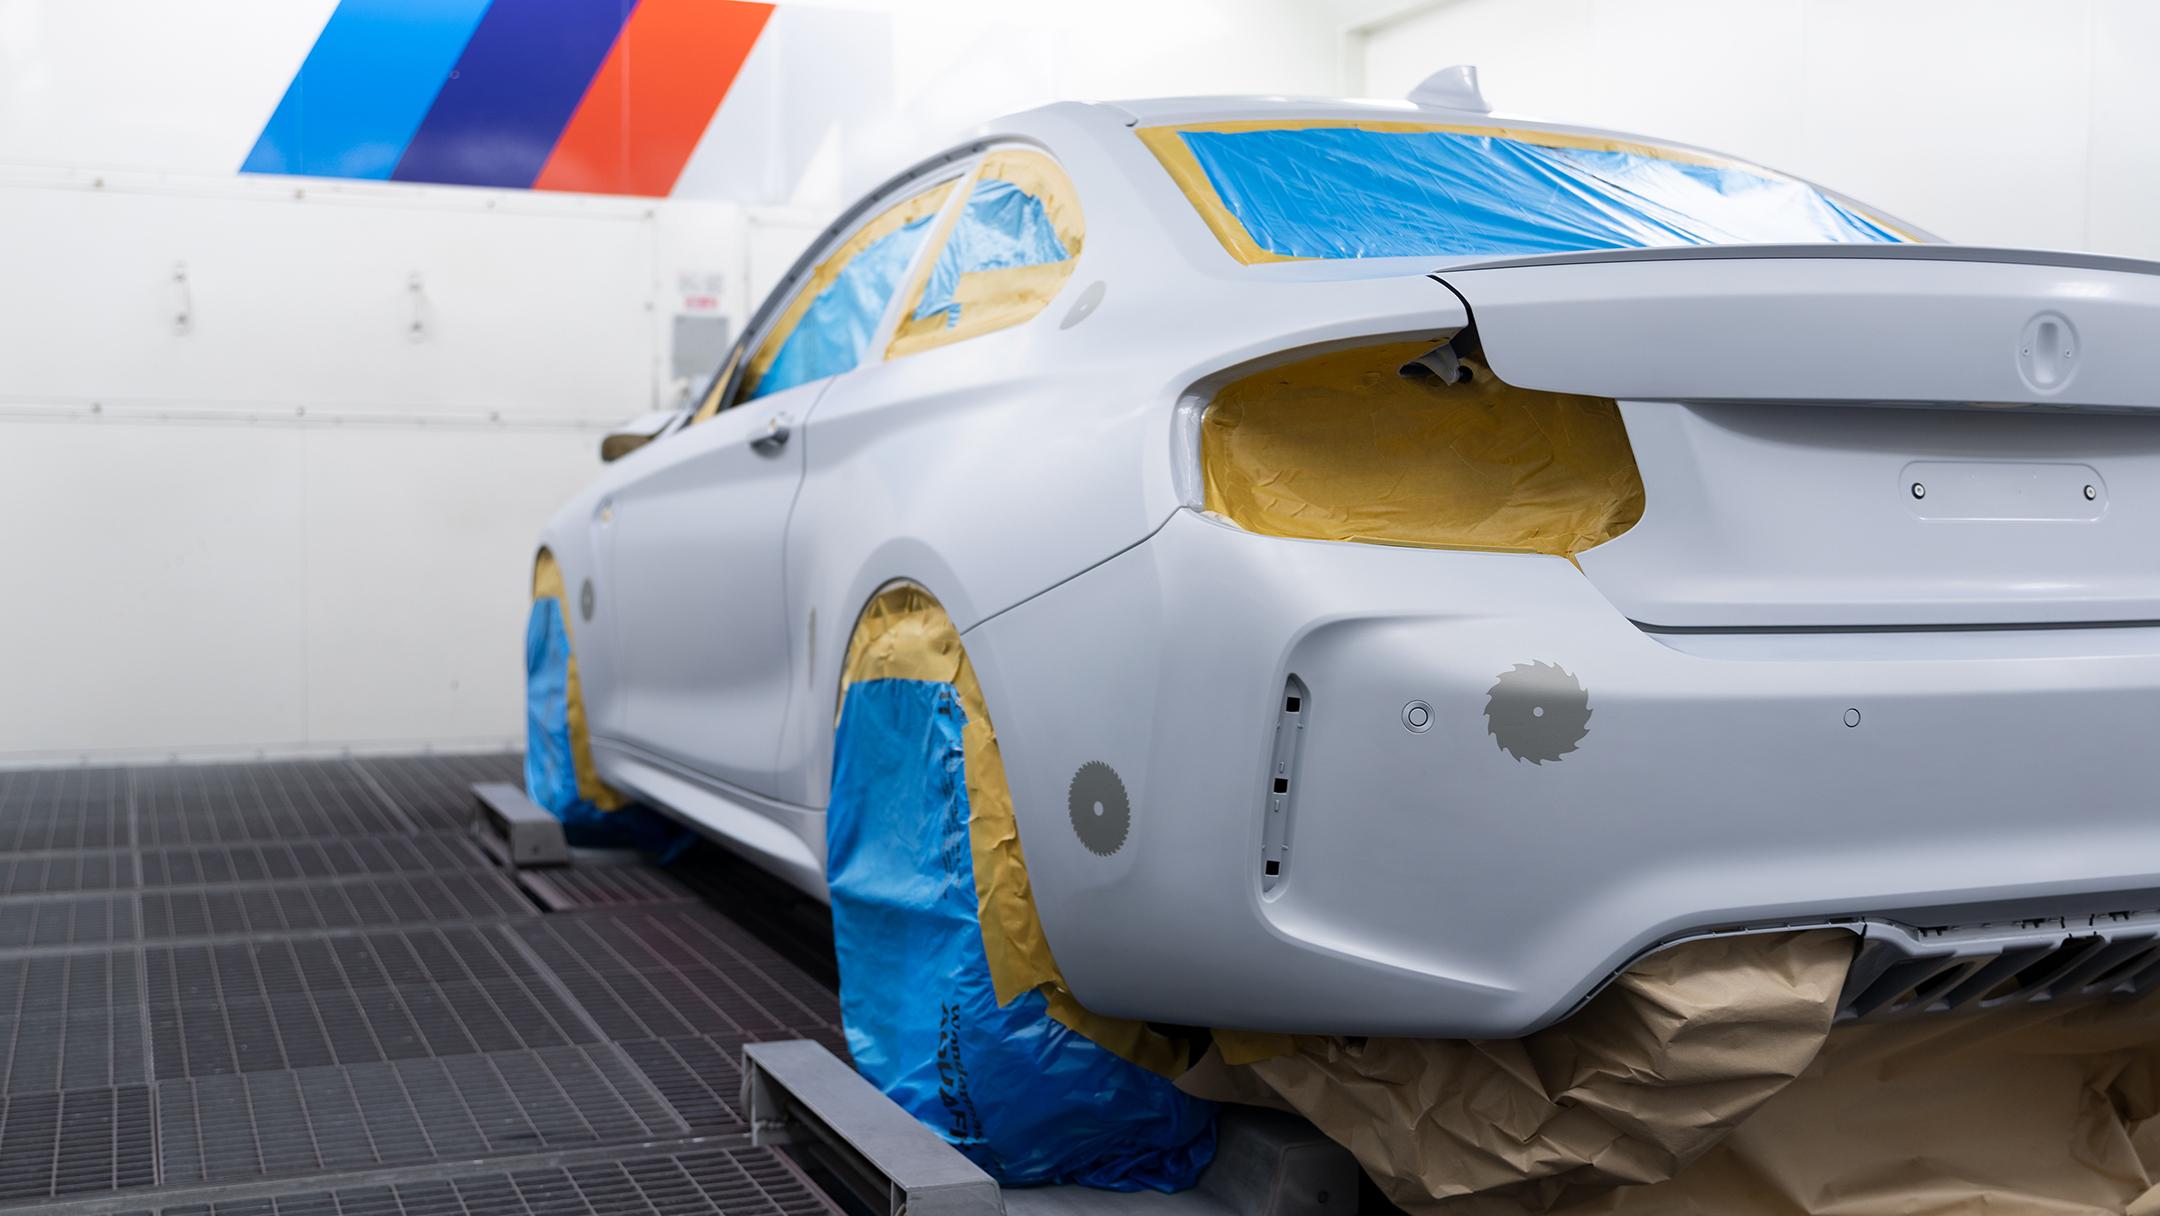 BMW M2 by FUTURA 2000 - Street Art Car - 2020 - working in progress - BMW M paint studio